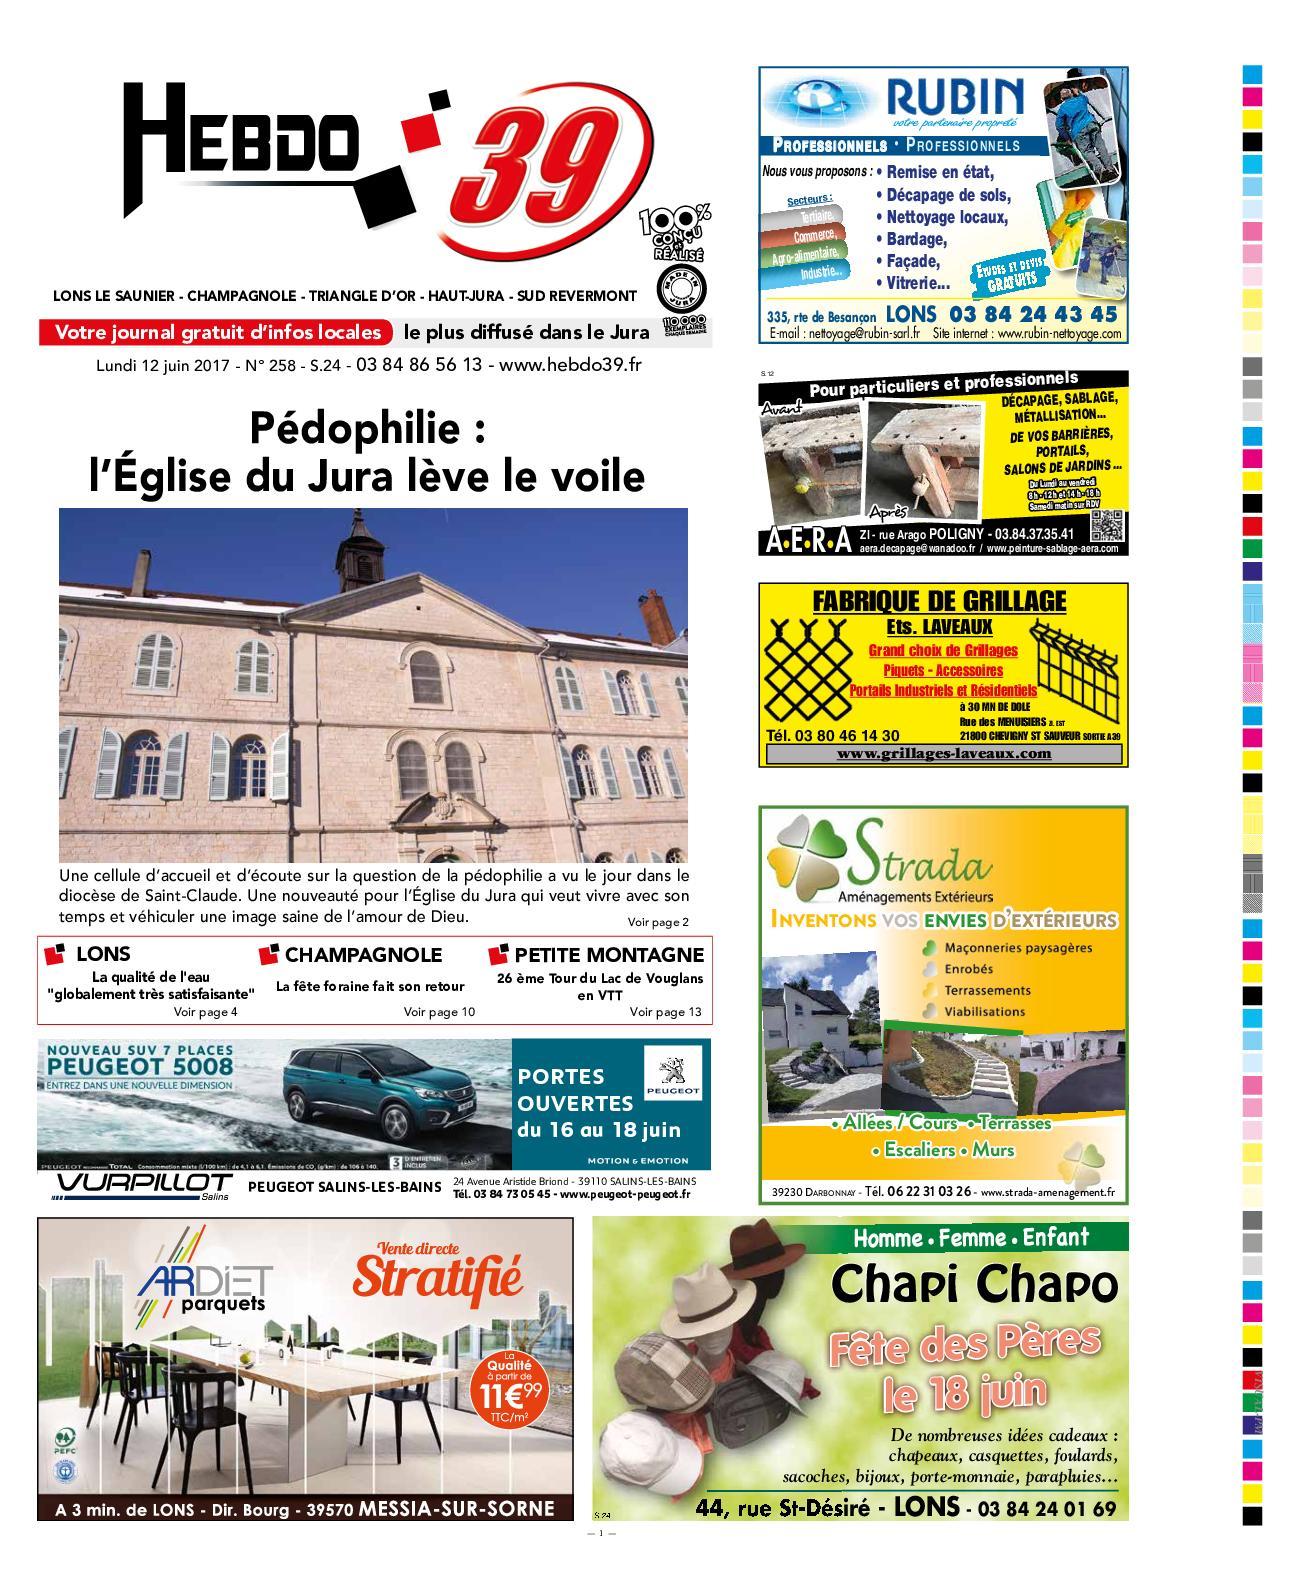 02-07 Osf Kit Réparation Régulateur Fenêtre RENAULT MEGANE 2 II Droit made in eu